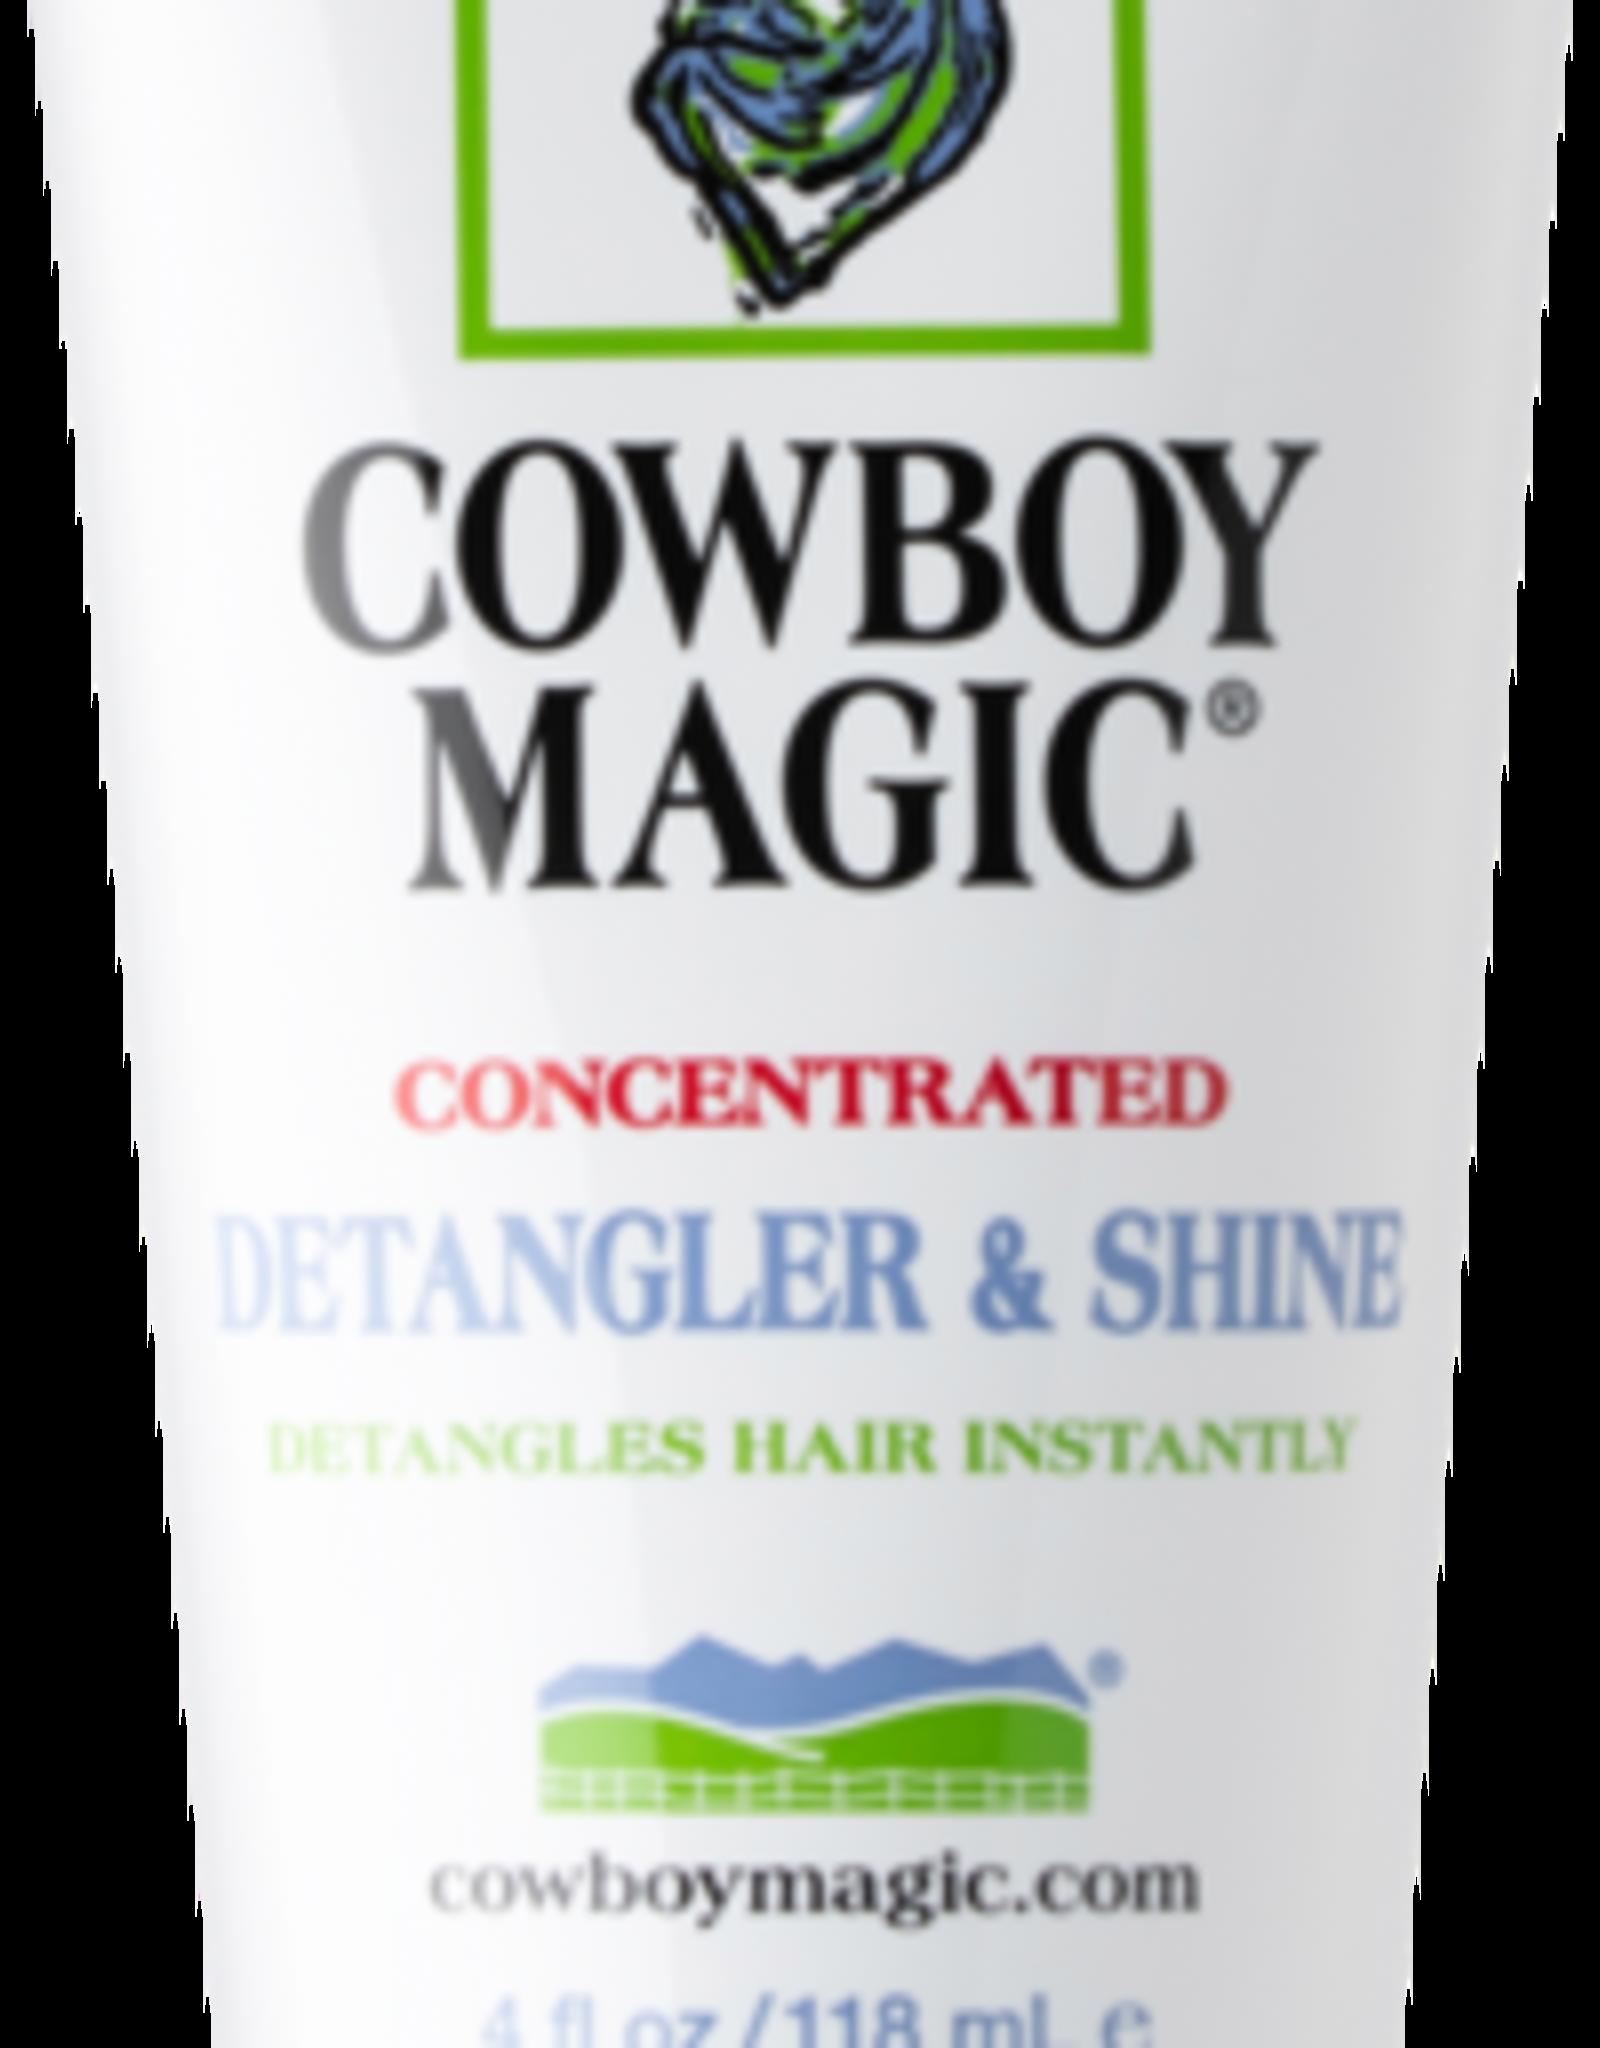 CHARMAR LAND & CATTLE CO COWBOY MAGIC DETANGLER/SHINE  4OZ